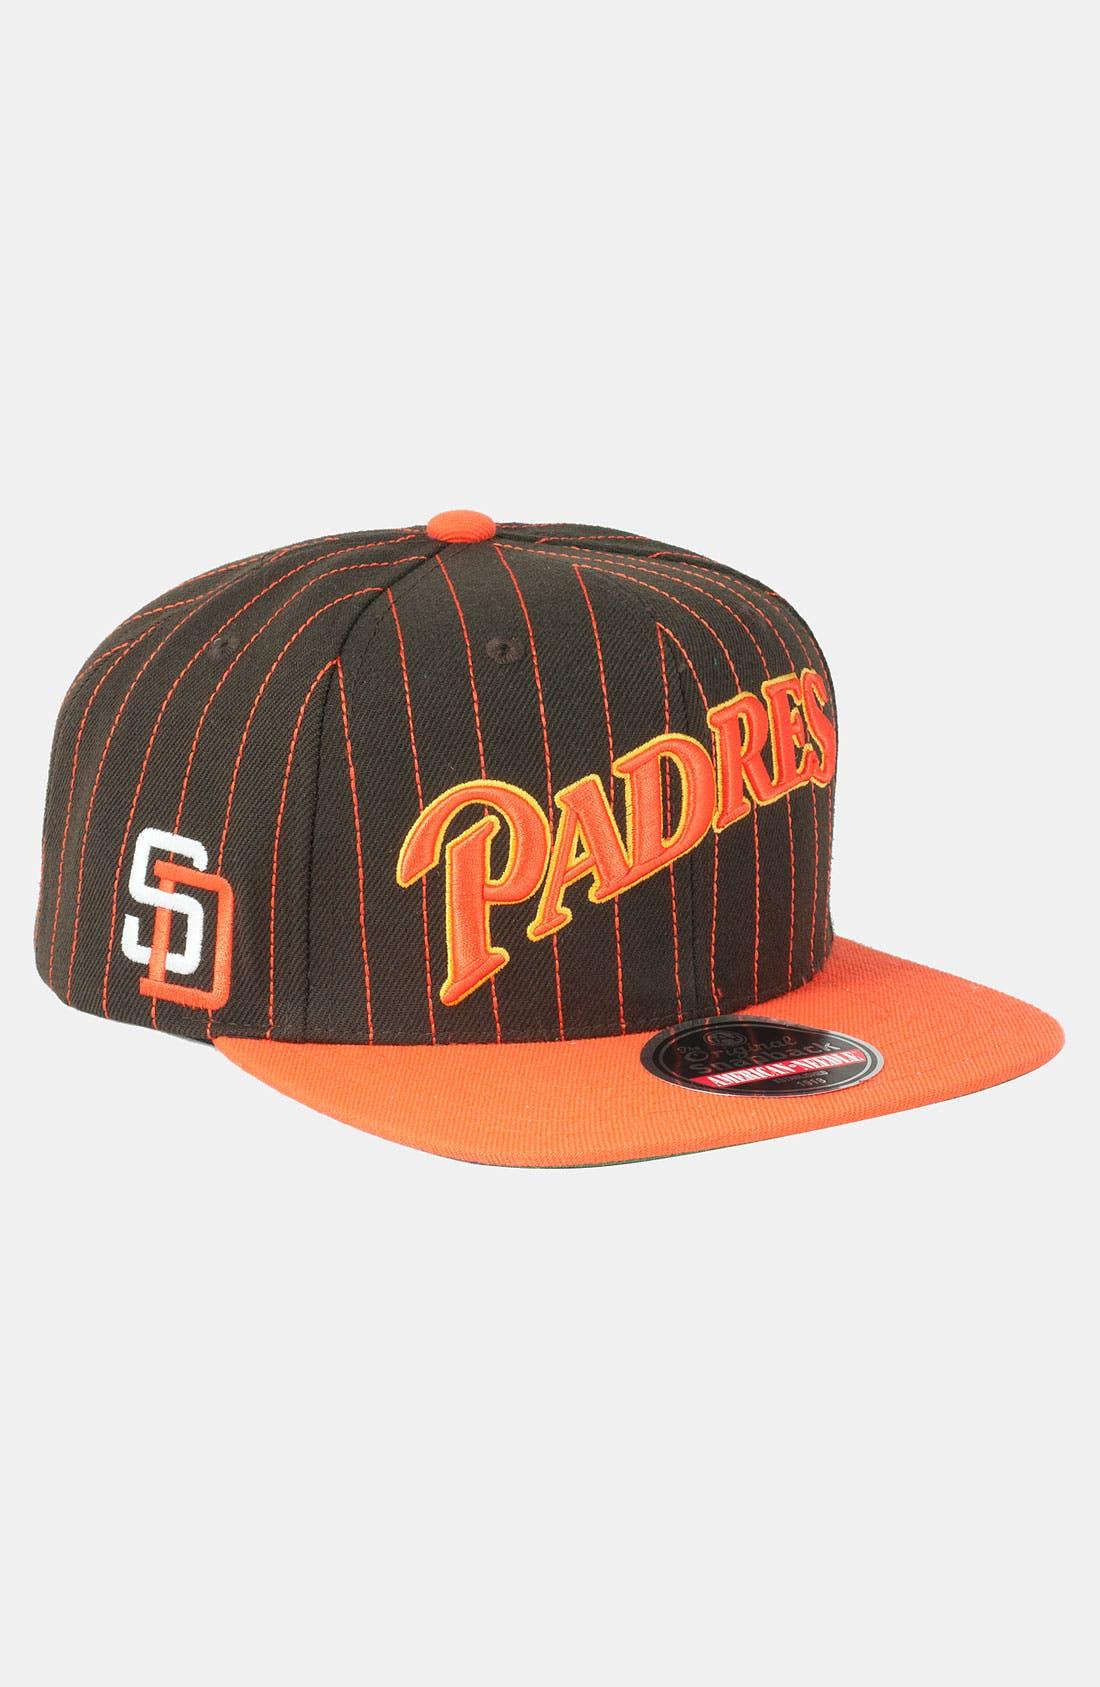 Main Image - American Needle 'Padres' Snapback Baseball Cap